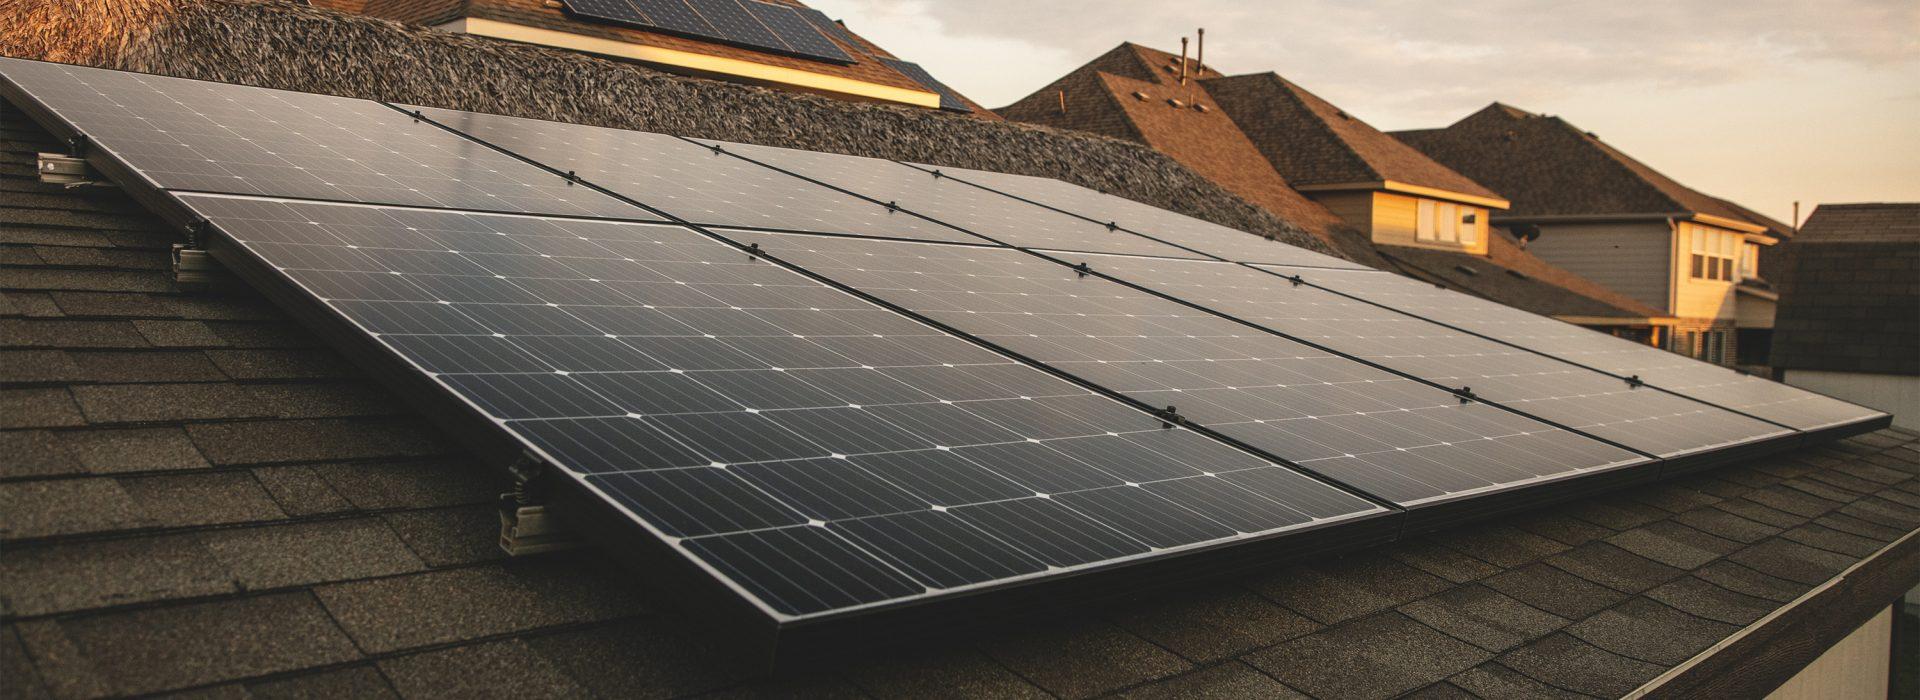 Residential Solar Installer located in Texas